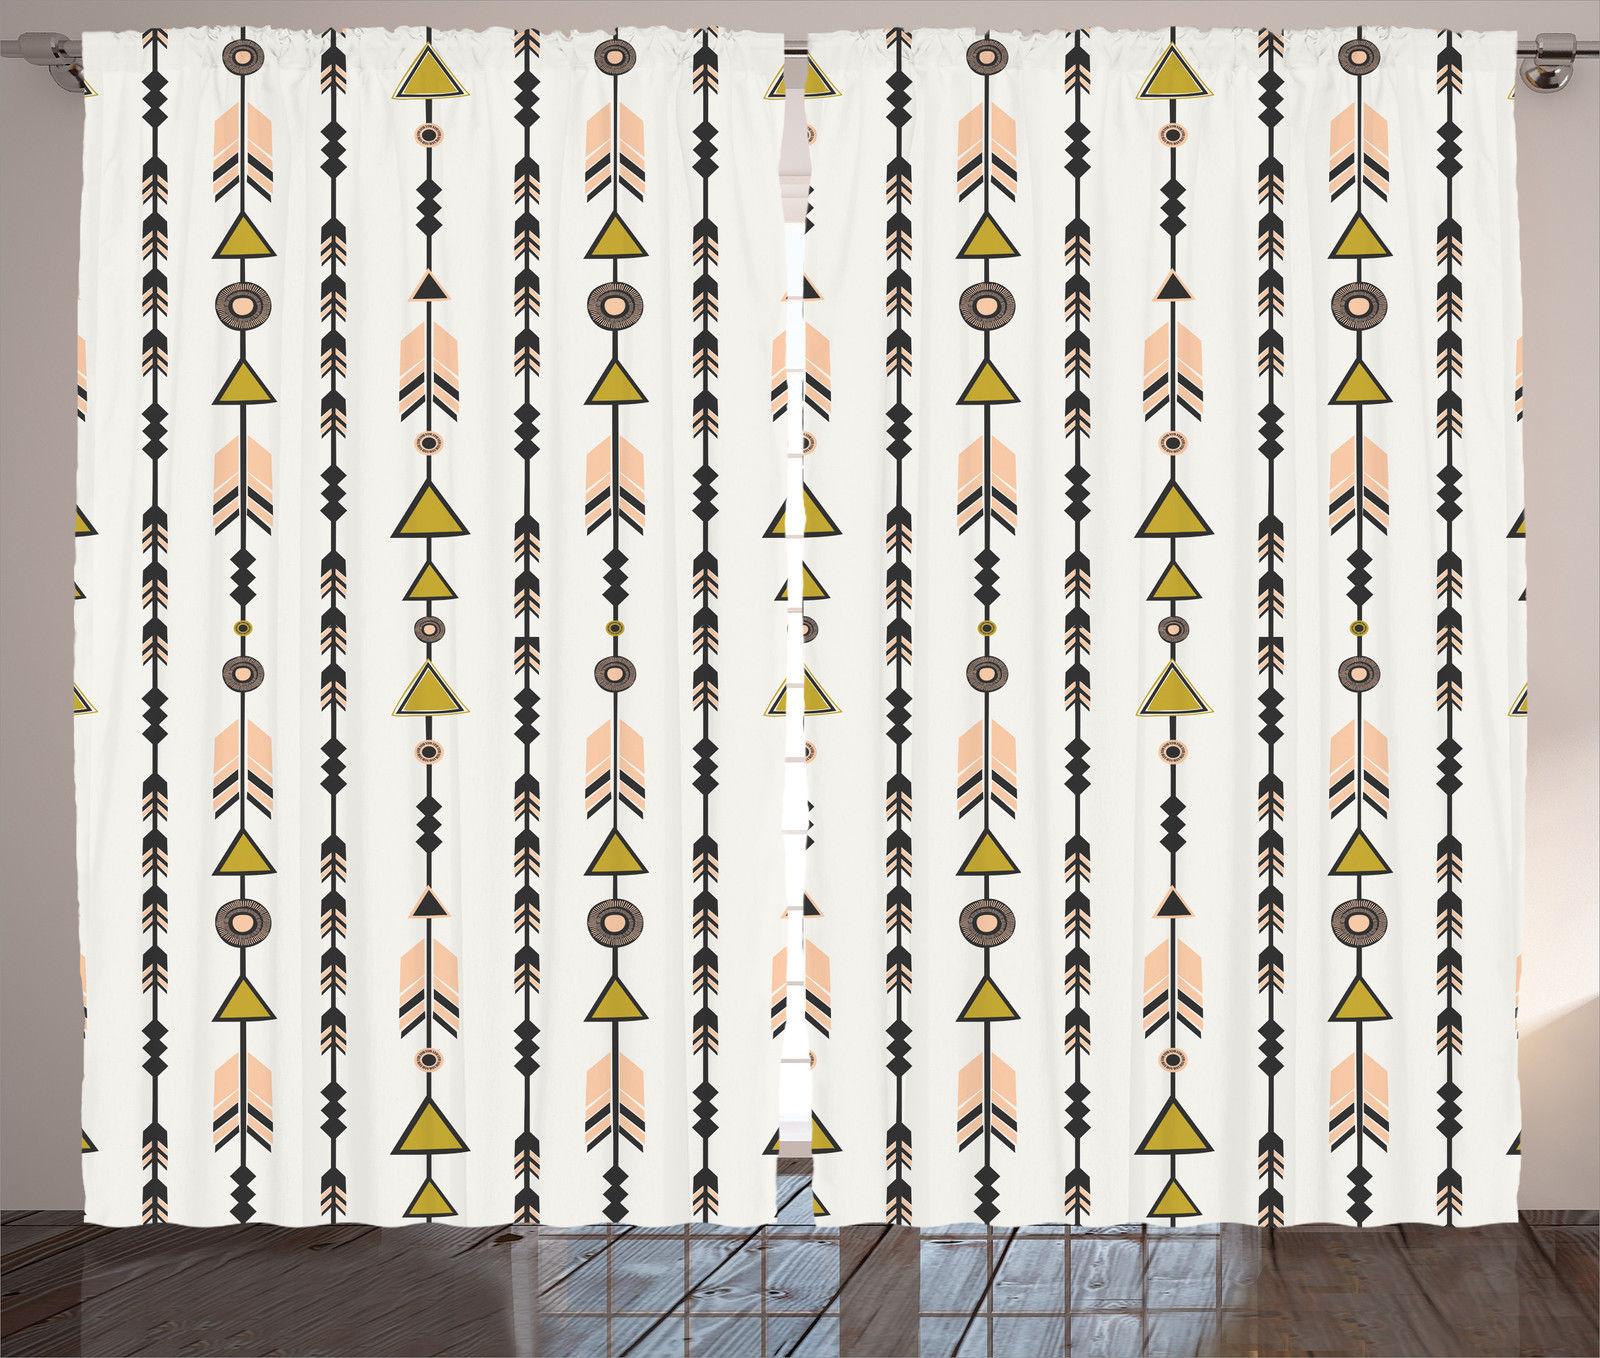 Tribal Style Arrow Geometric Patterns Cultural Boho Print